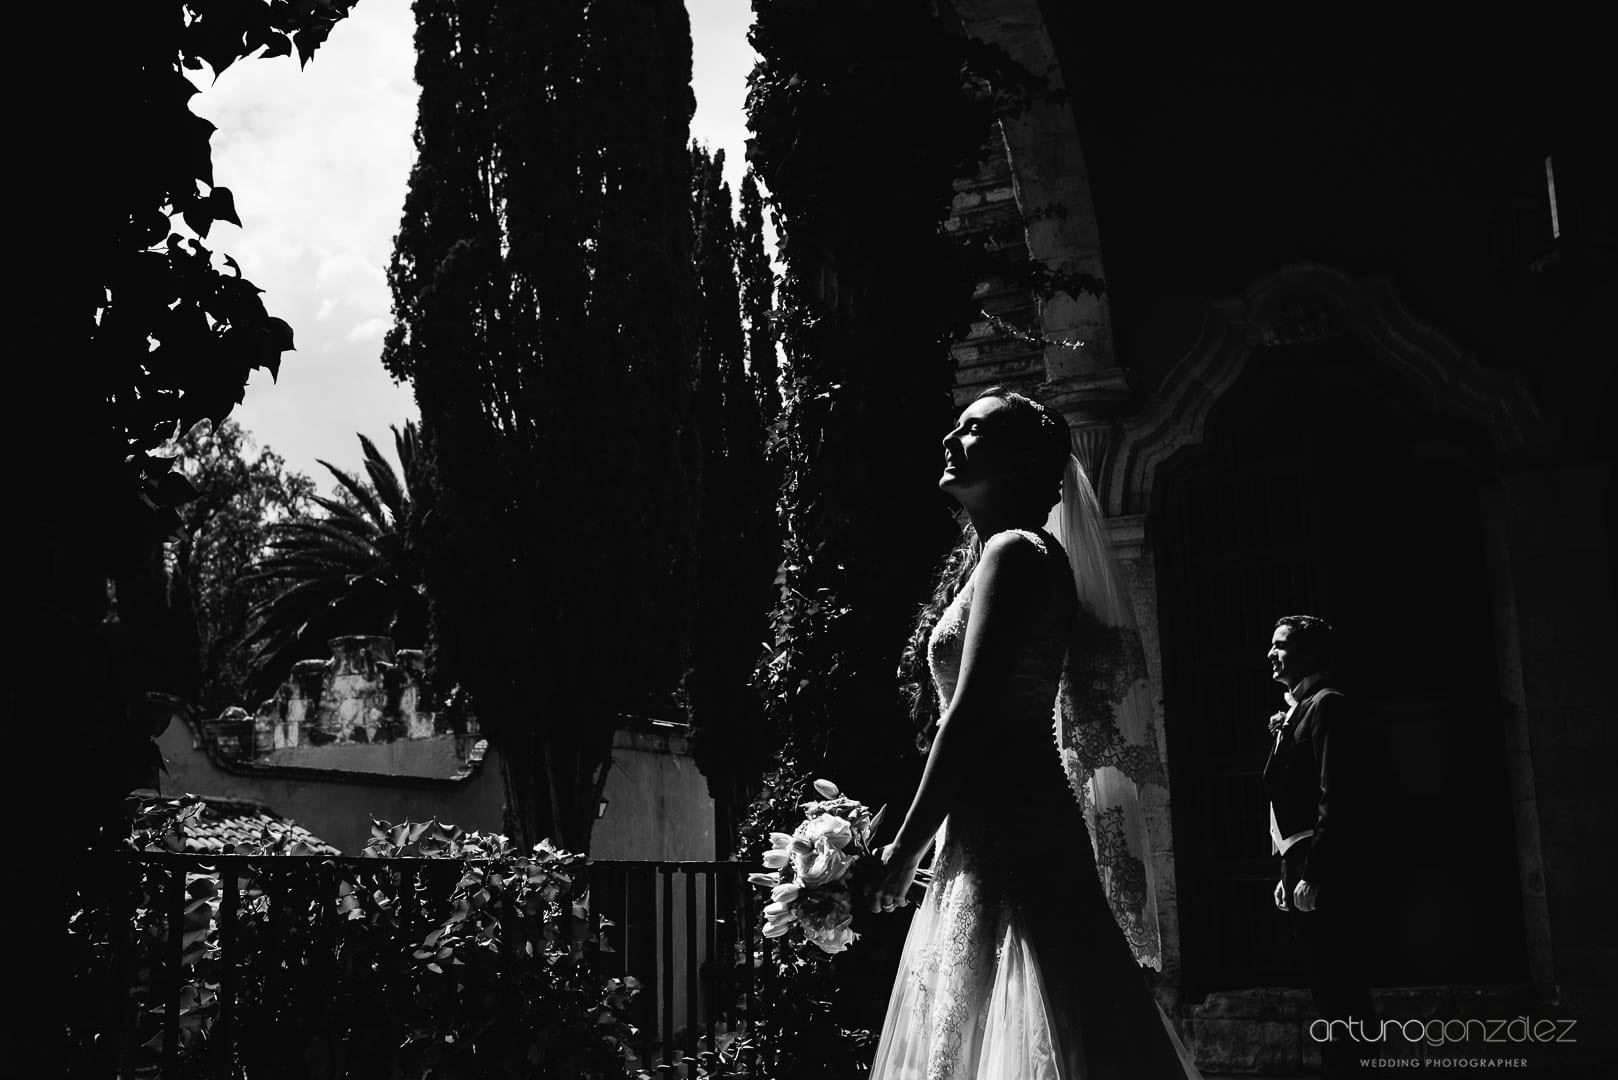 fotografo-de-bodas-en-guanajuato-38